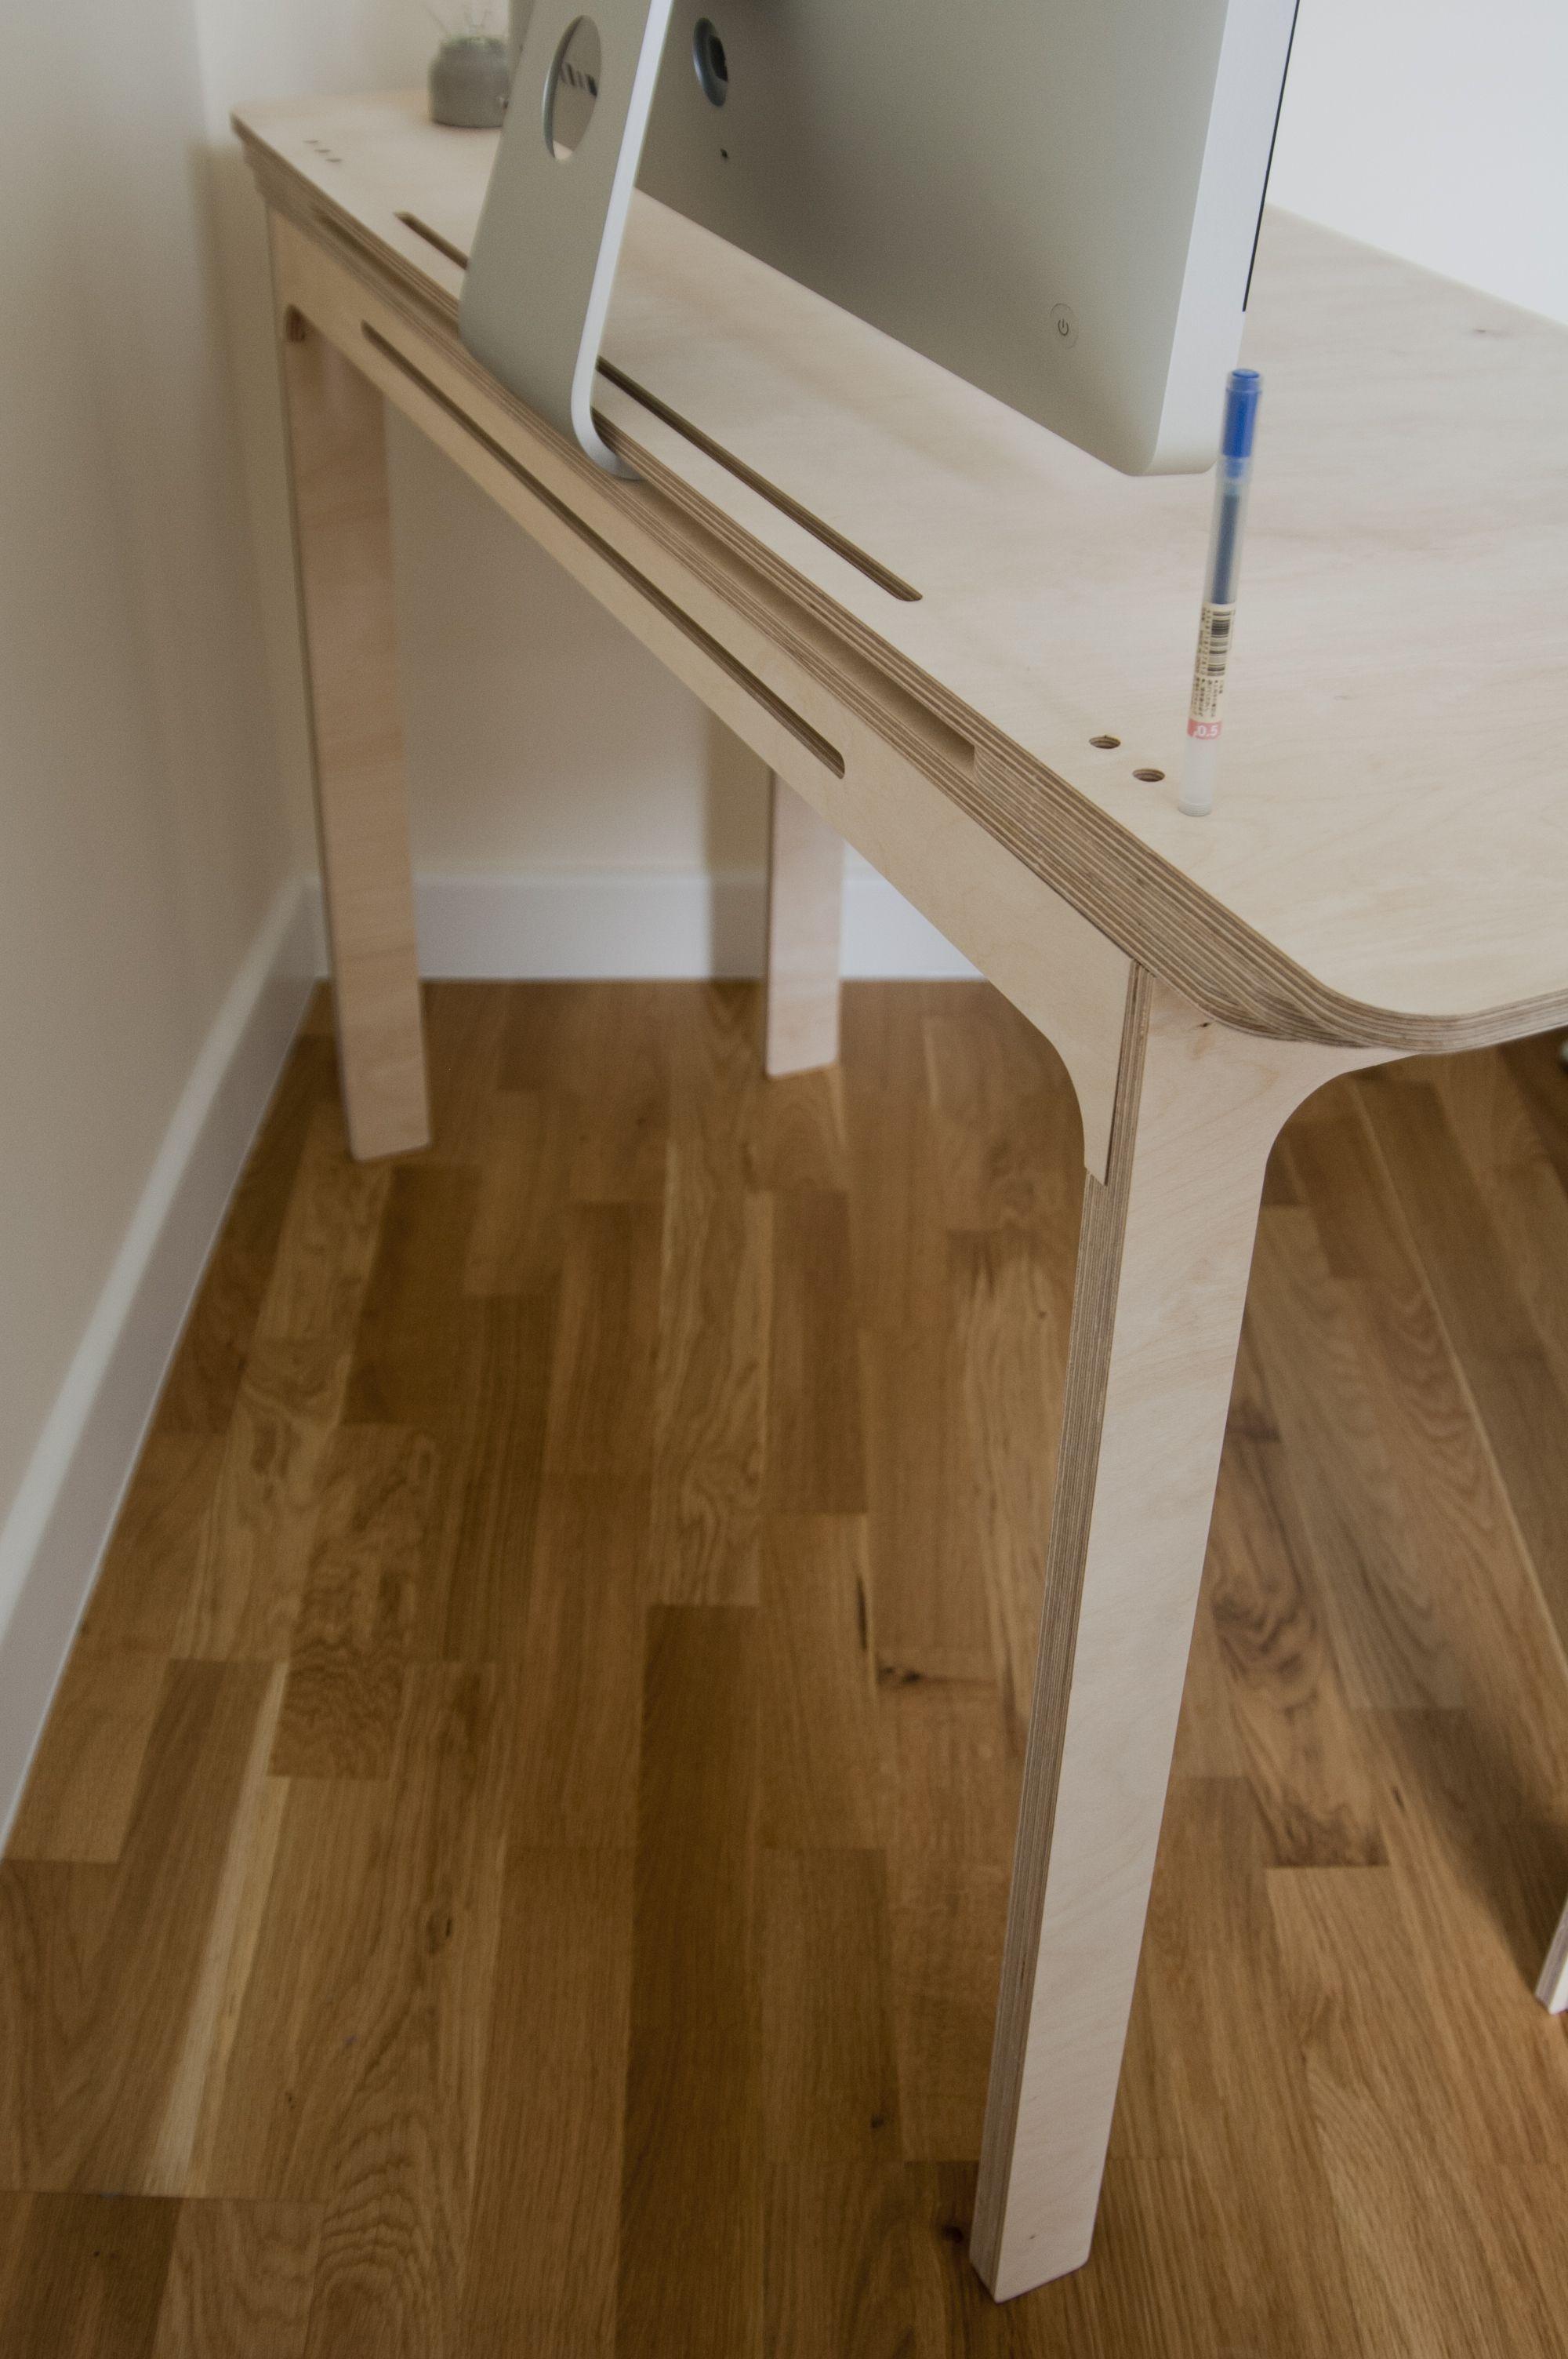 Plywood Desk Design : plywood, design, Plywood, Inbuilt, Shelf, Organisers., Desk,, Setup,